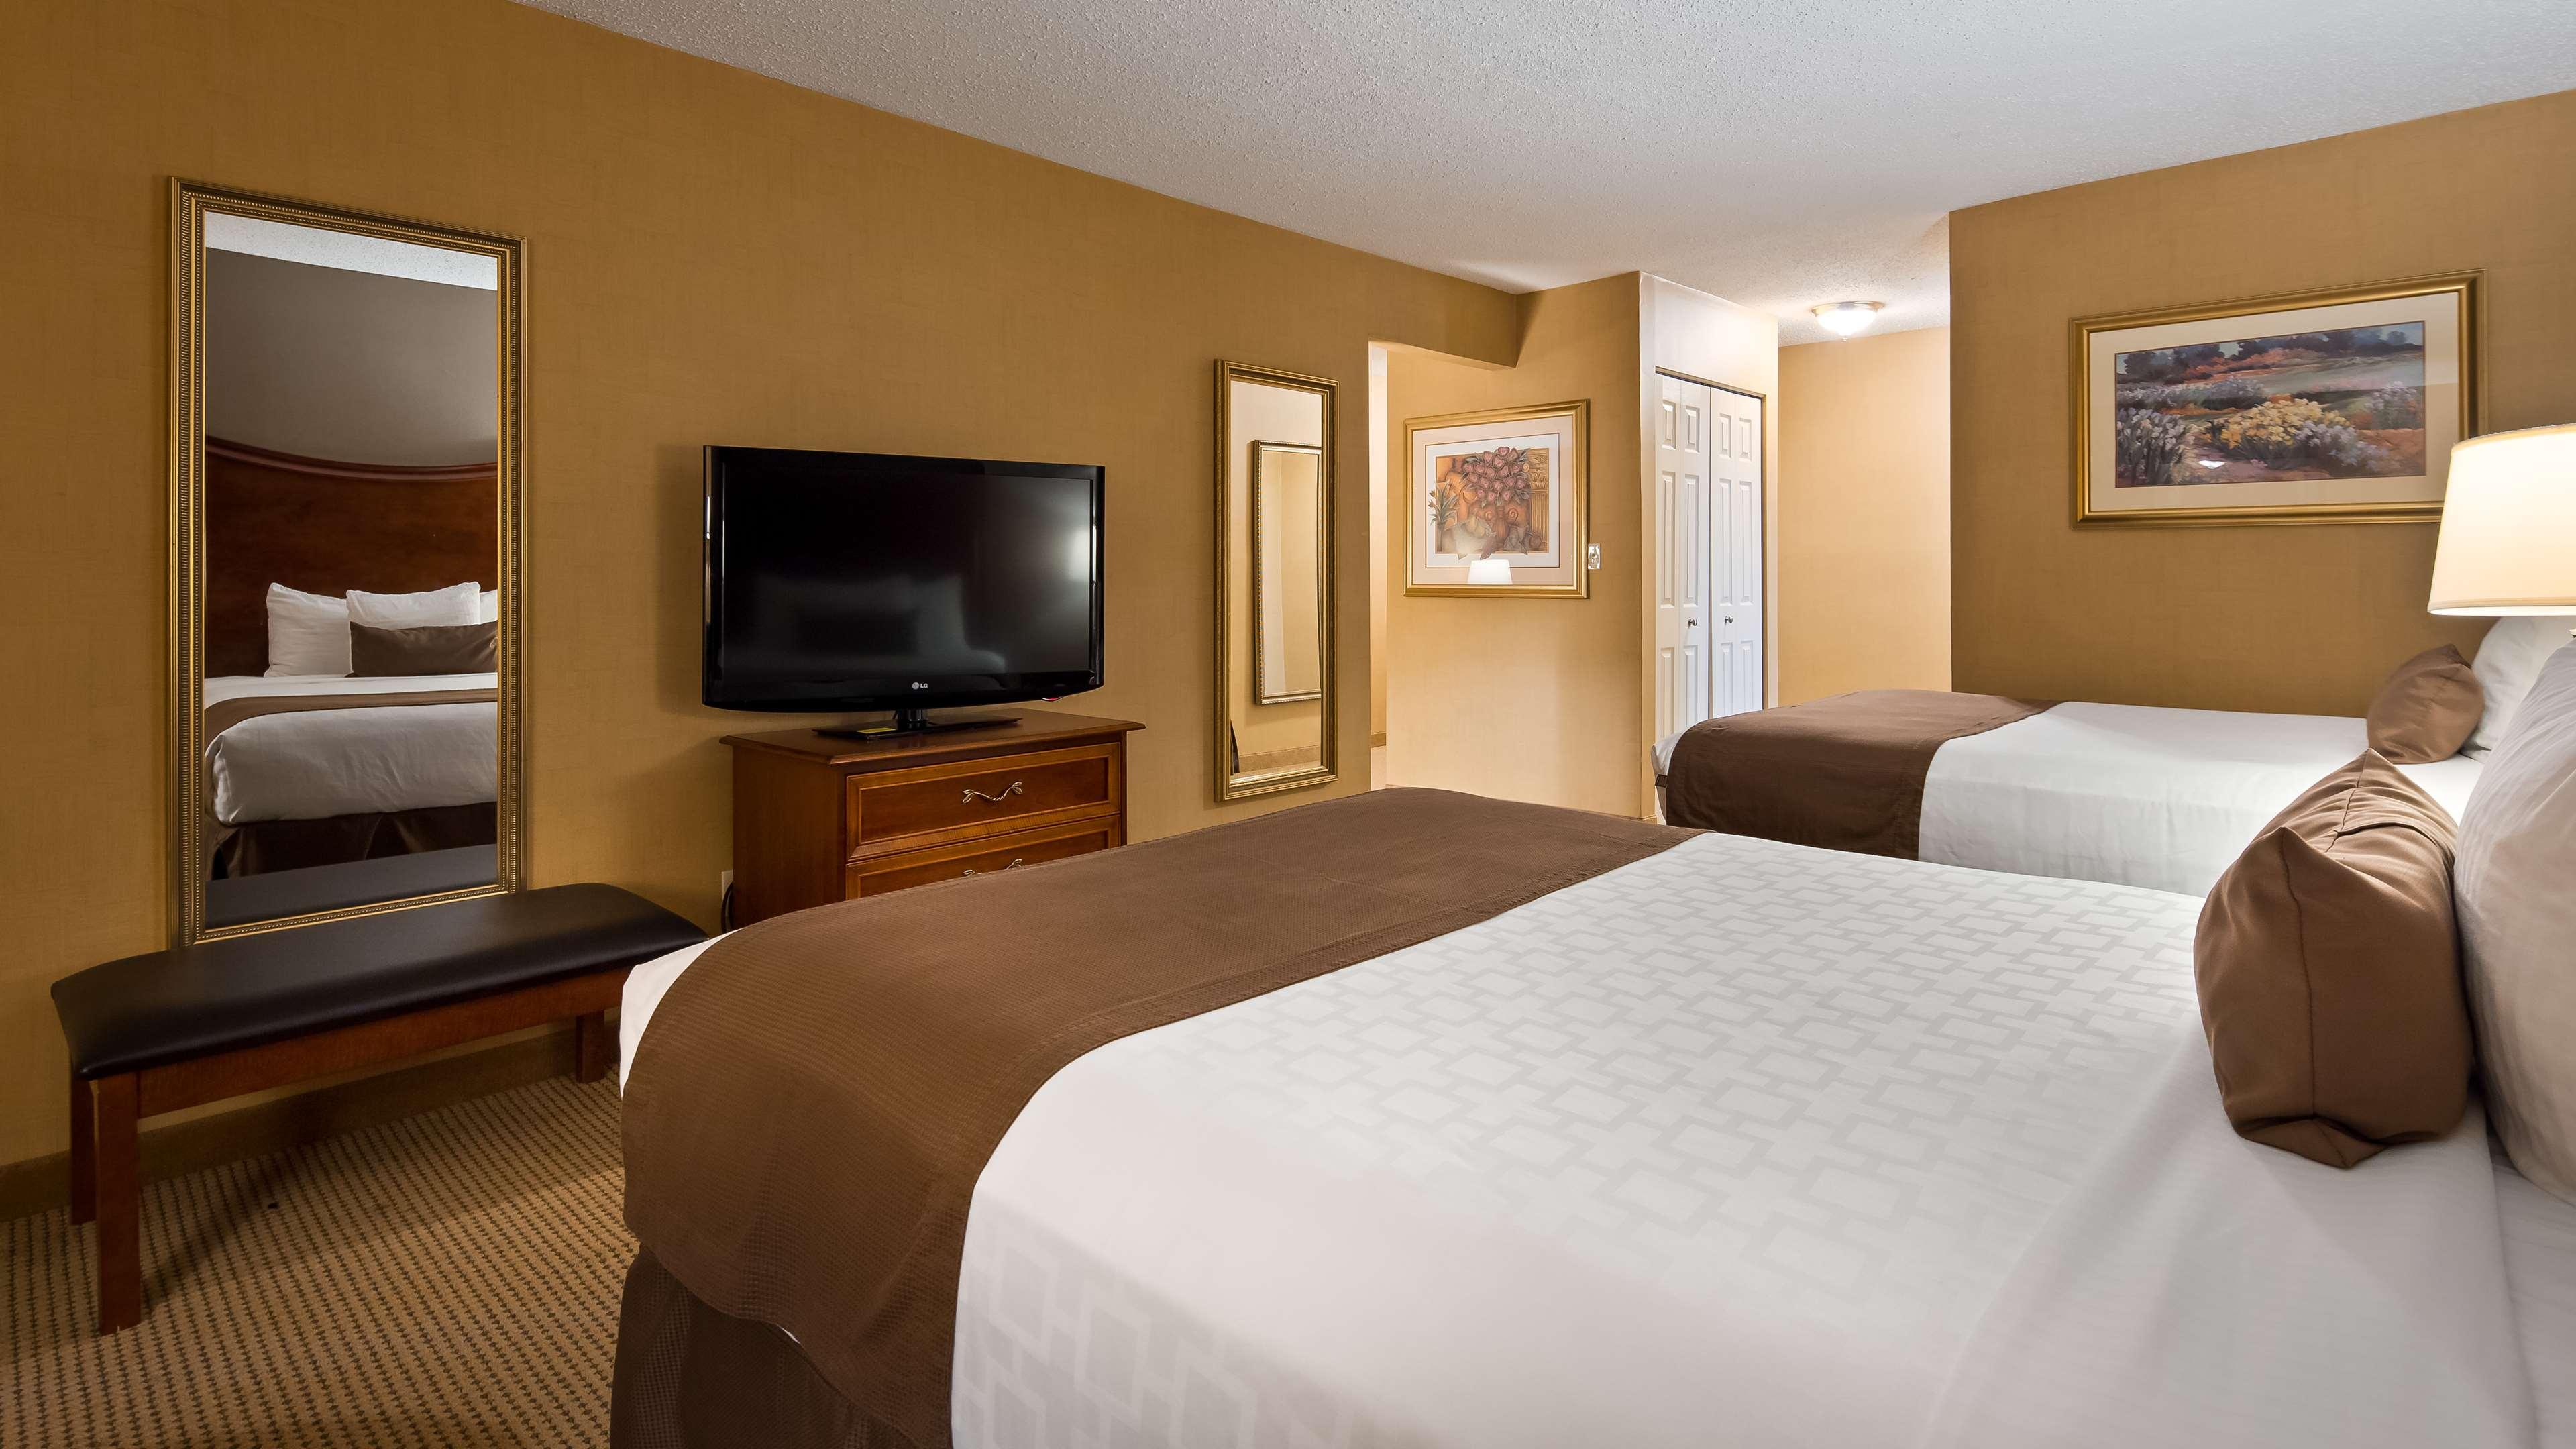 Best Western Plus North Haven Hotel image 19